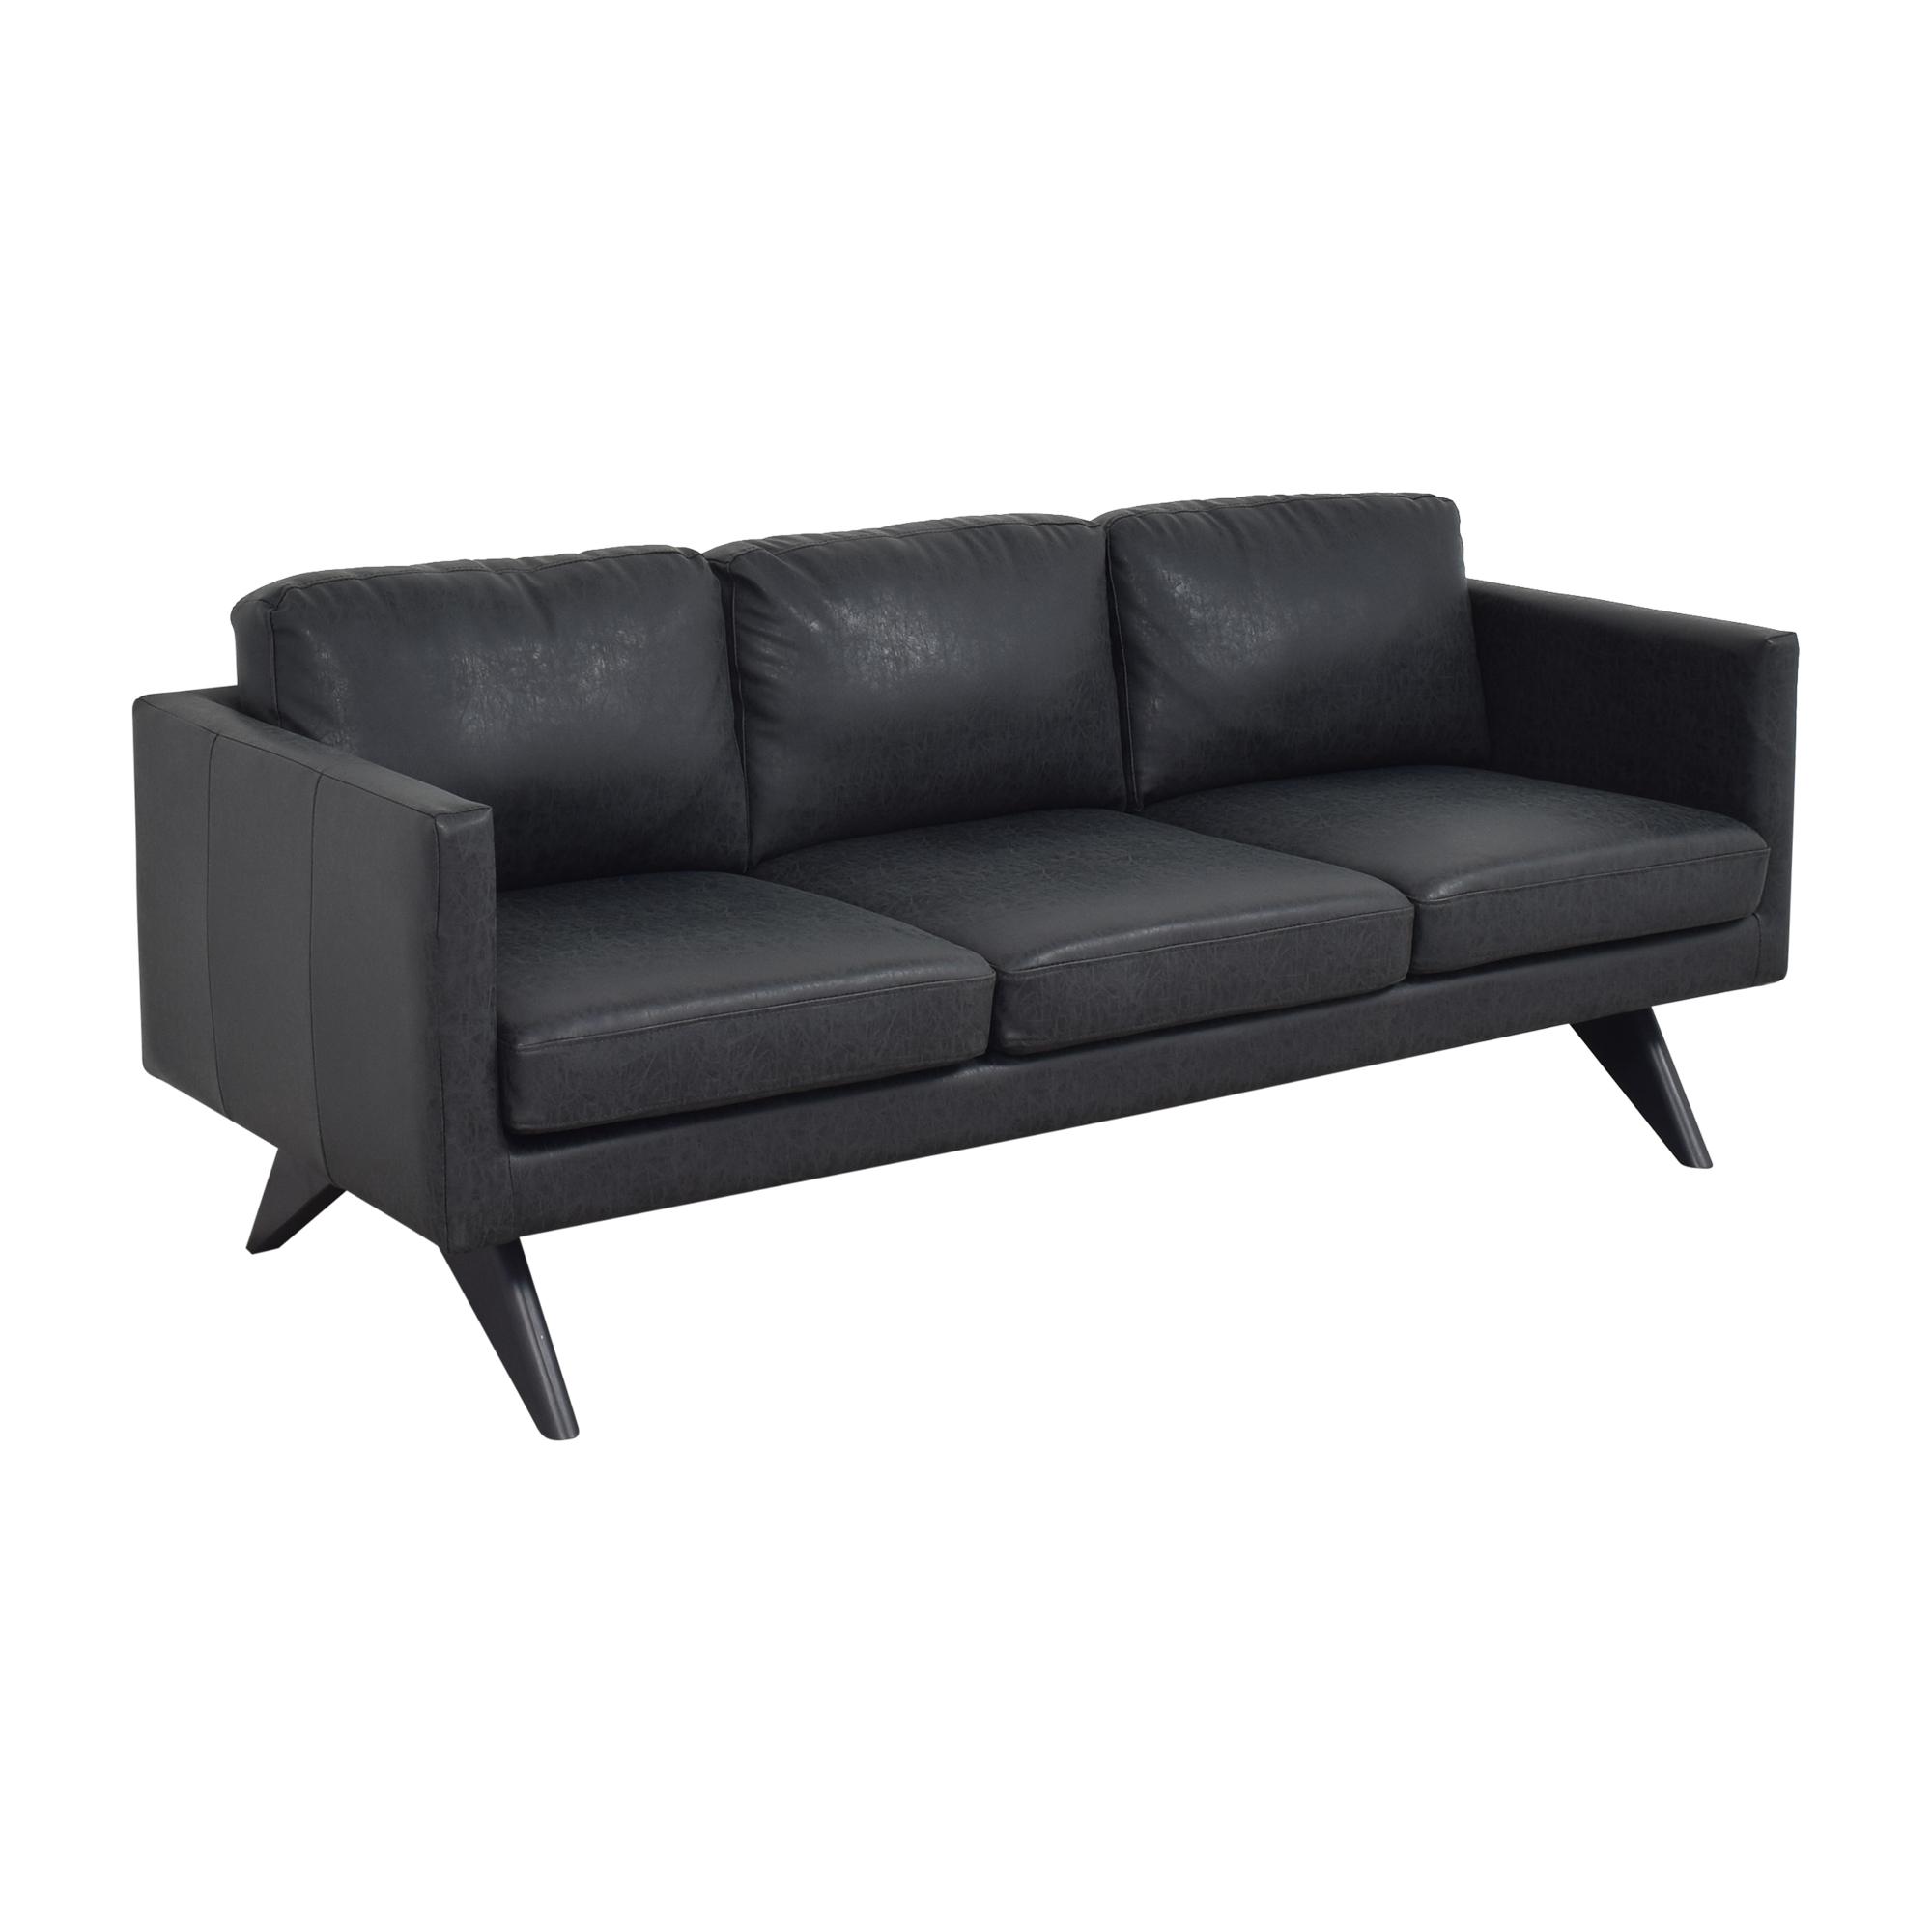 AllModern AllModern Square Arm Sofa dark gray